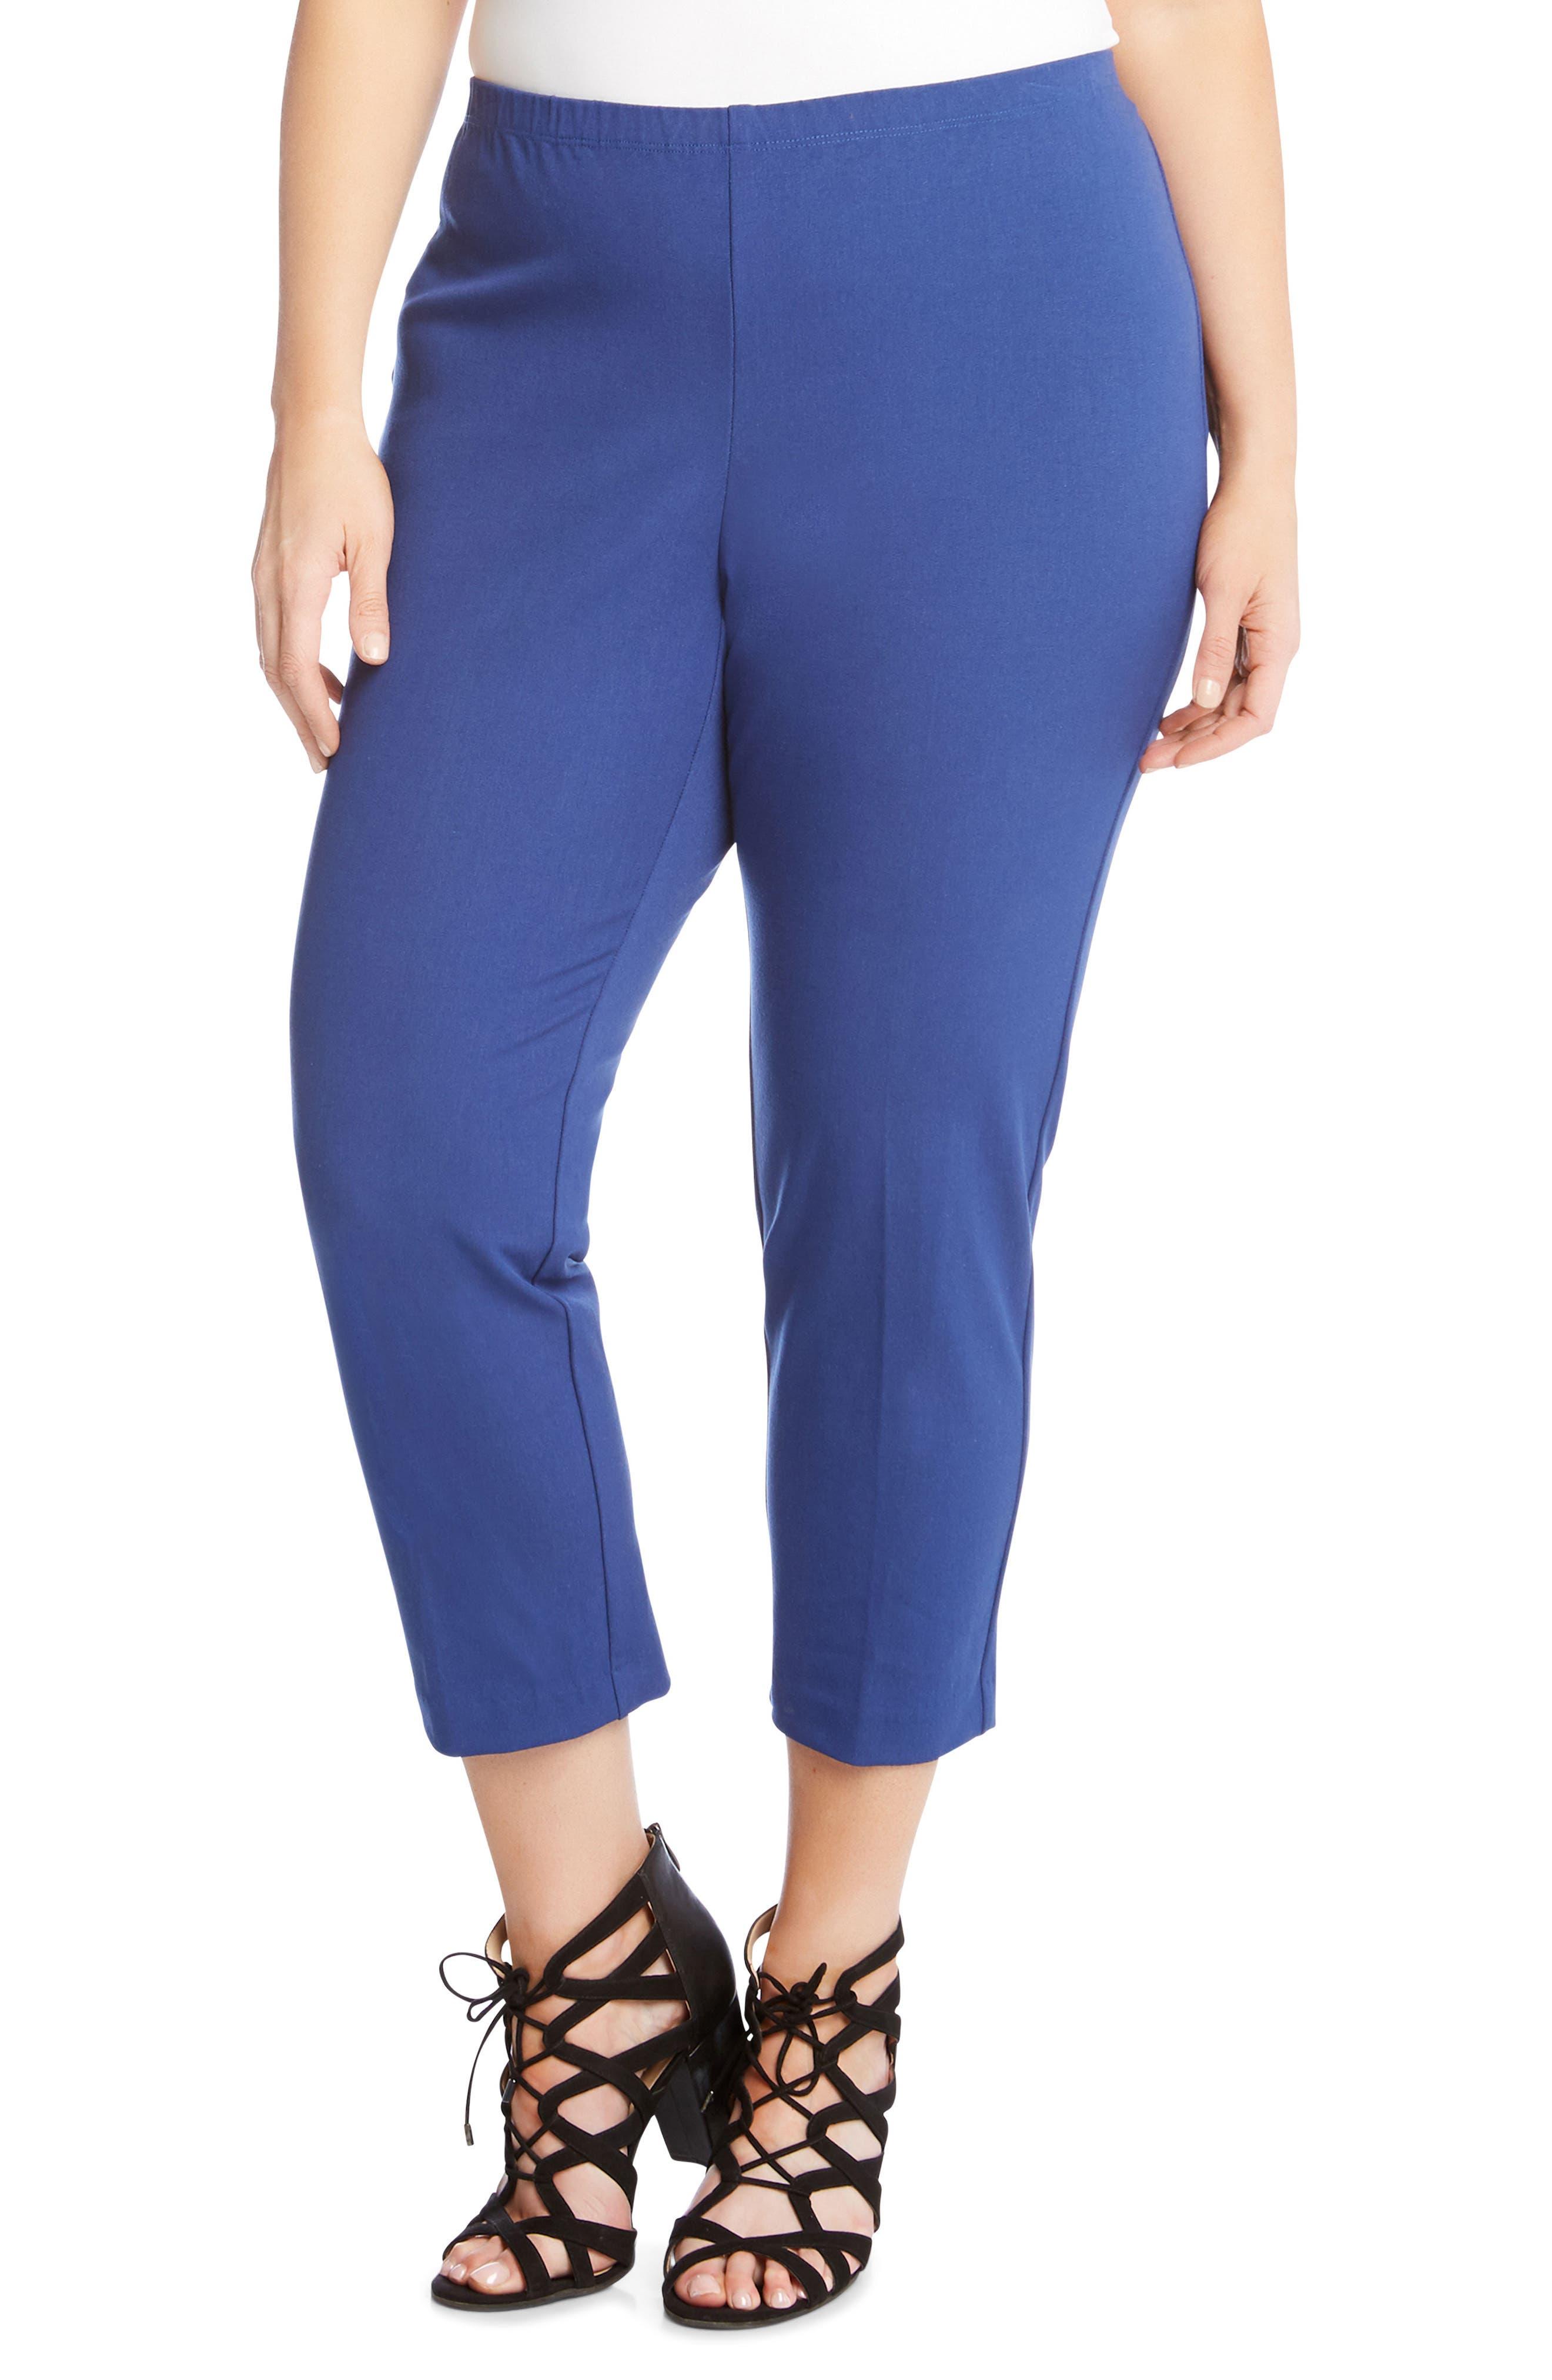 Alternate Image 1 Selected - Karen Kane Piper Skinny Ankle Pants (Plus Size)